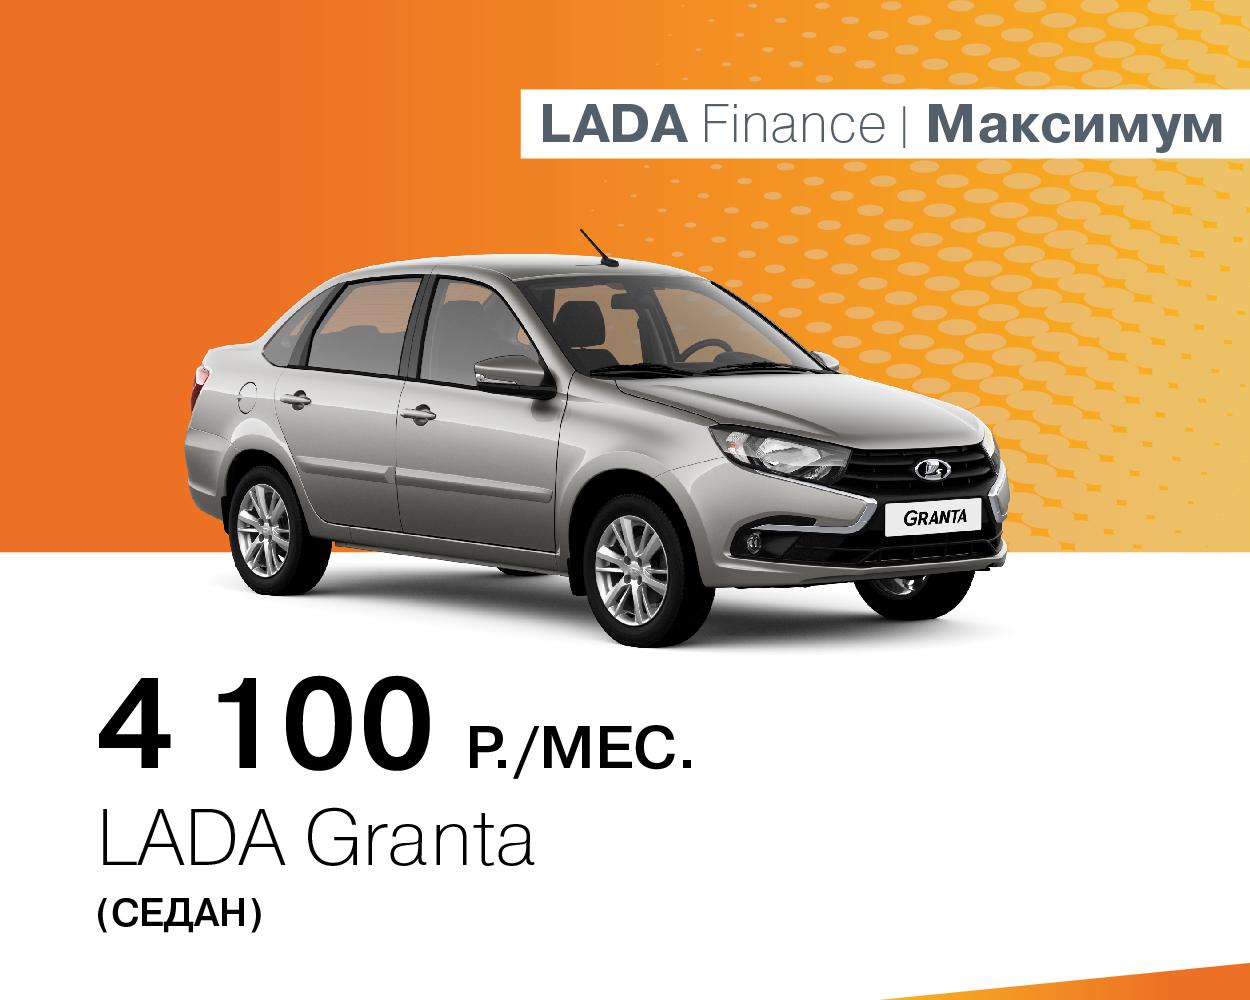 LADA Granta седан за 4100 руб./месяц